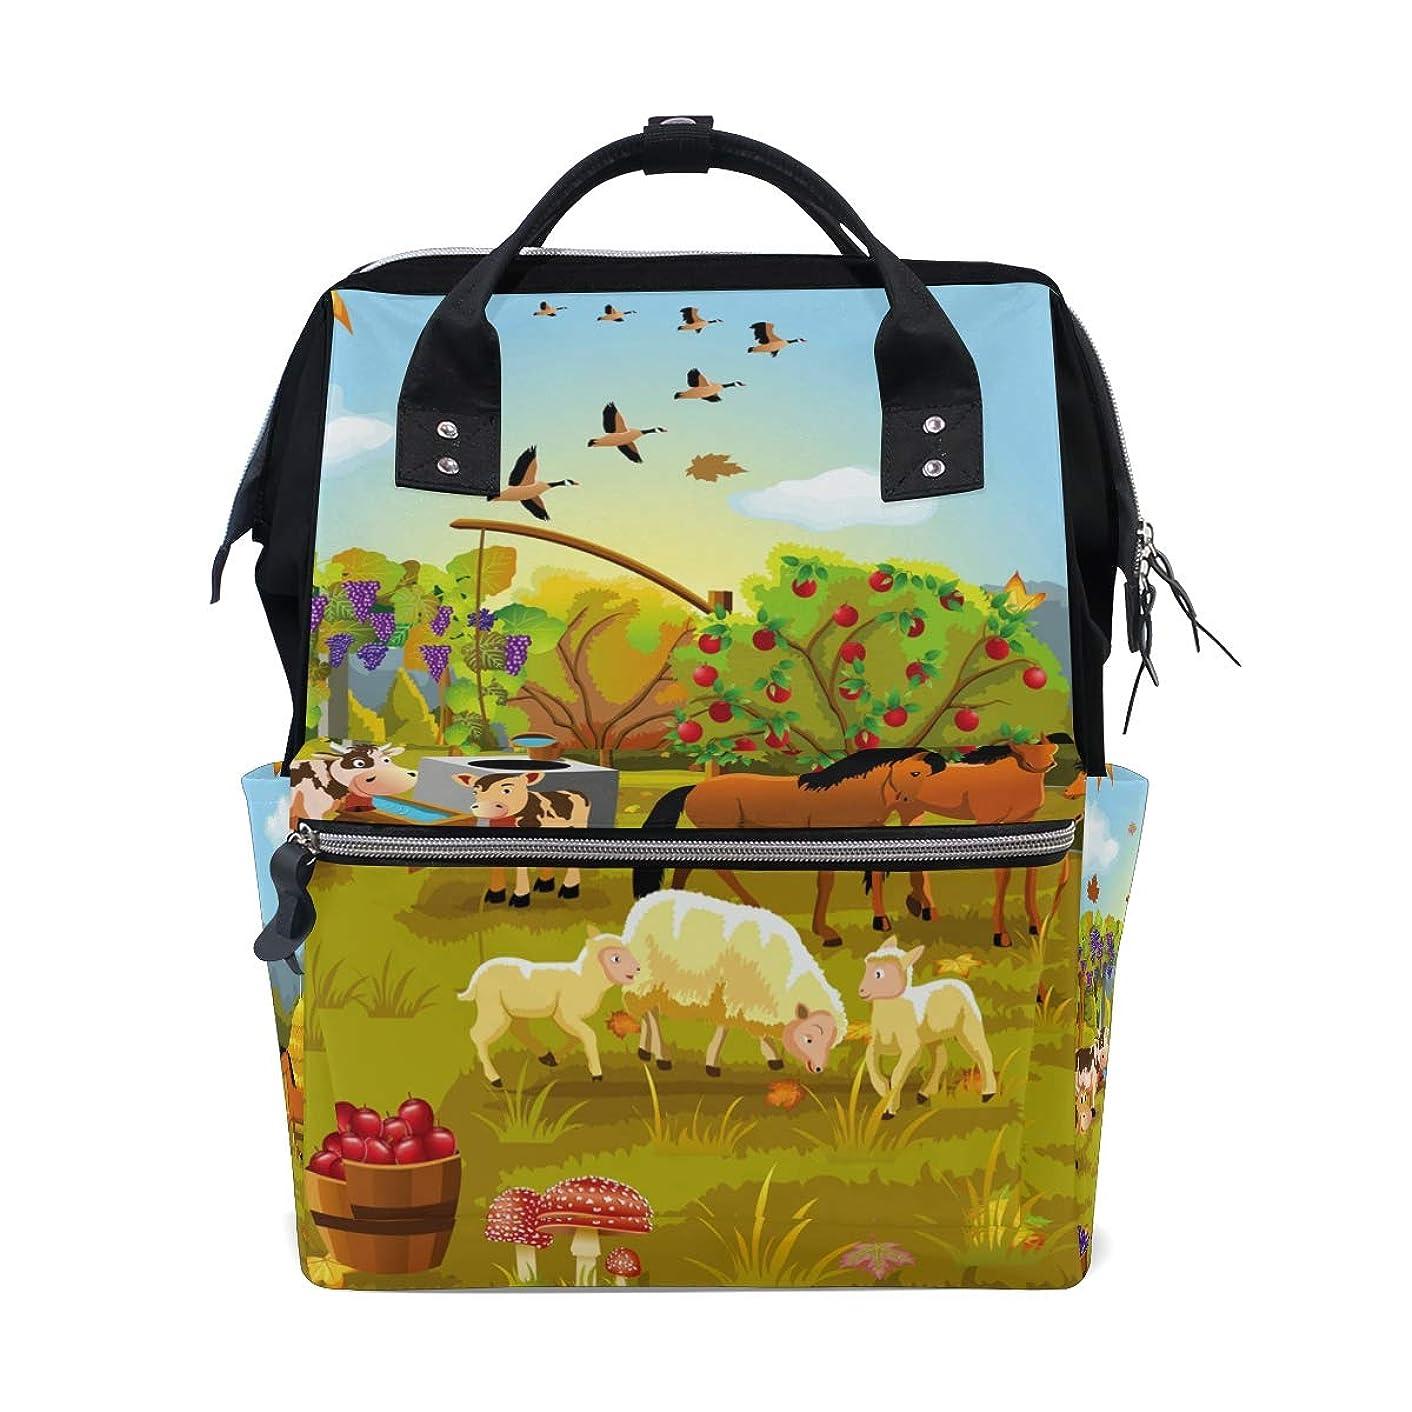 Cartoon Farm Animals Autumn School Backpack Large Capacity Mummy Bags Laptop Handbag Casual Travel Rucksack Satchel For Women Men Adult Teen Children